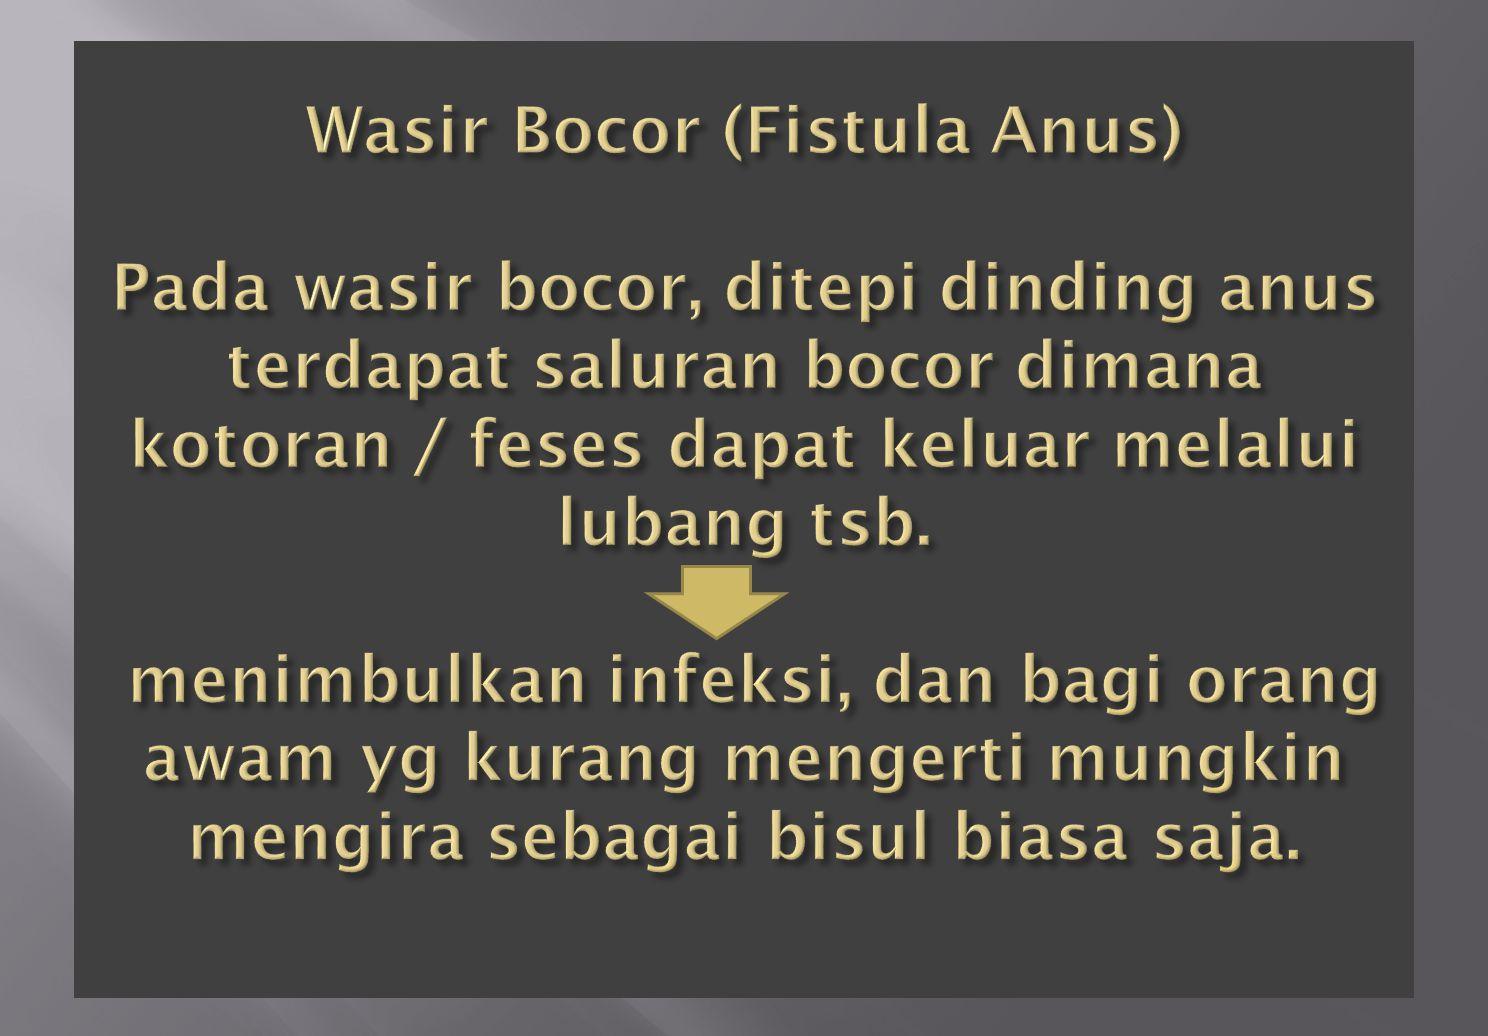 Wasir Bocor (Fistula Anus) Pada wasir bocor, ditepi dinding anus terdapat saluran bocor dimana kotoran / feses dapat keluar melalui lubang tsb.